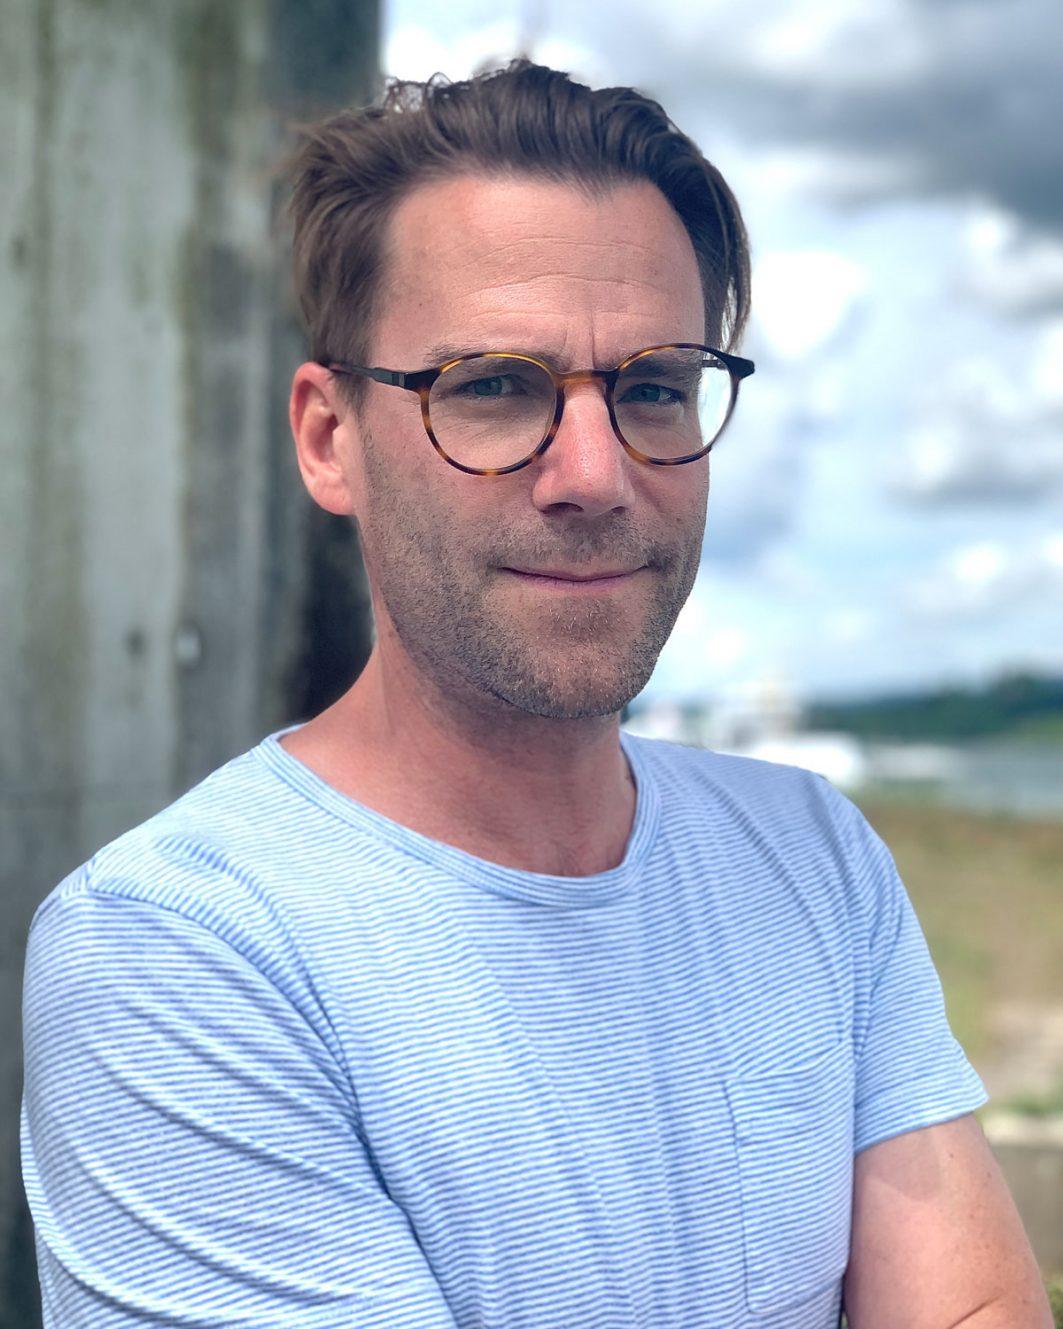 Erik Schmelz